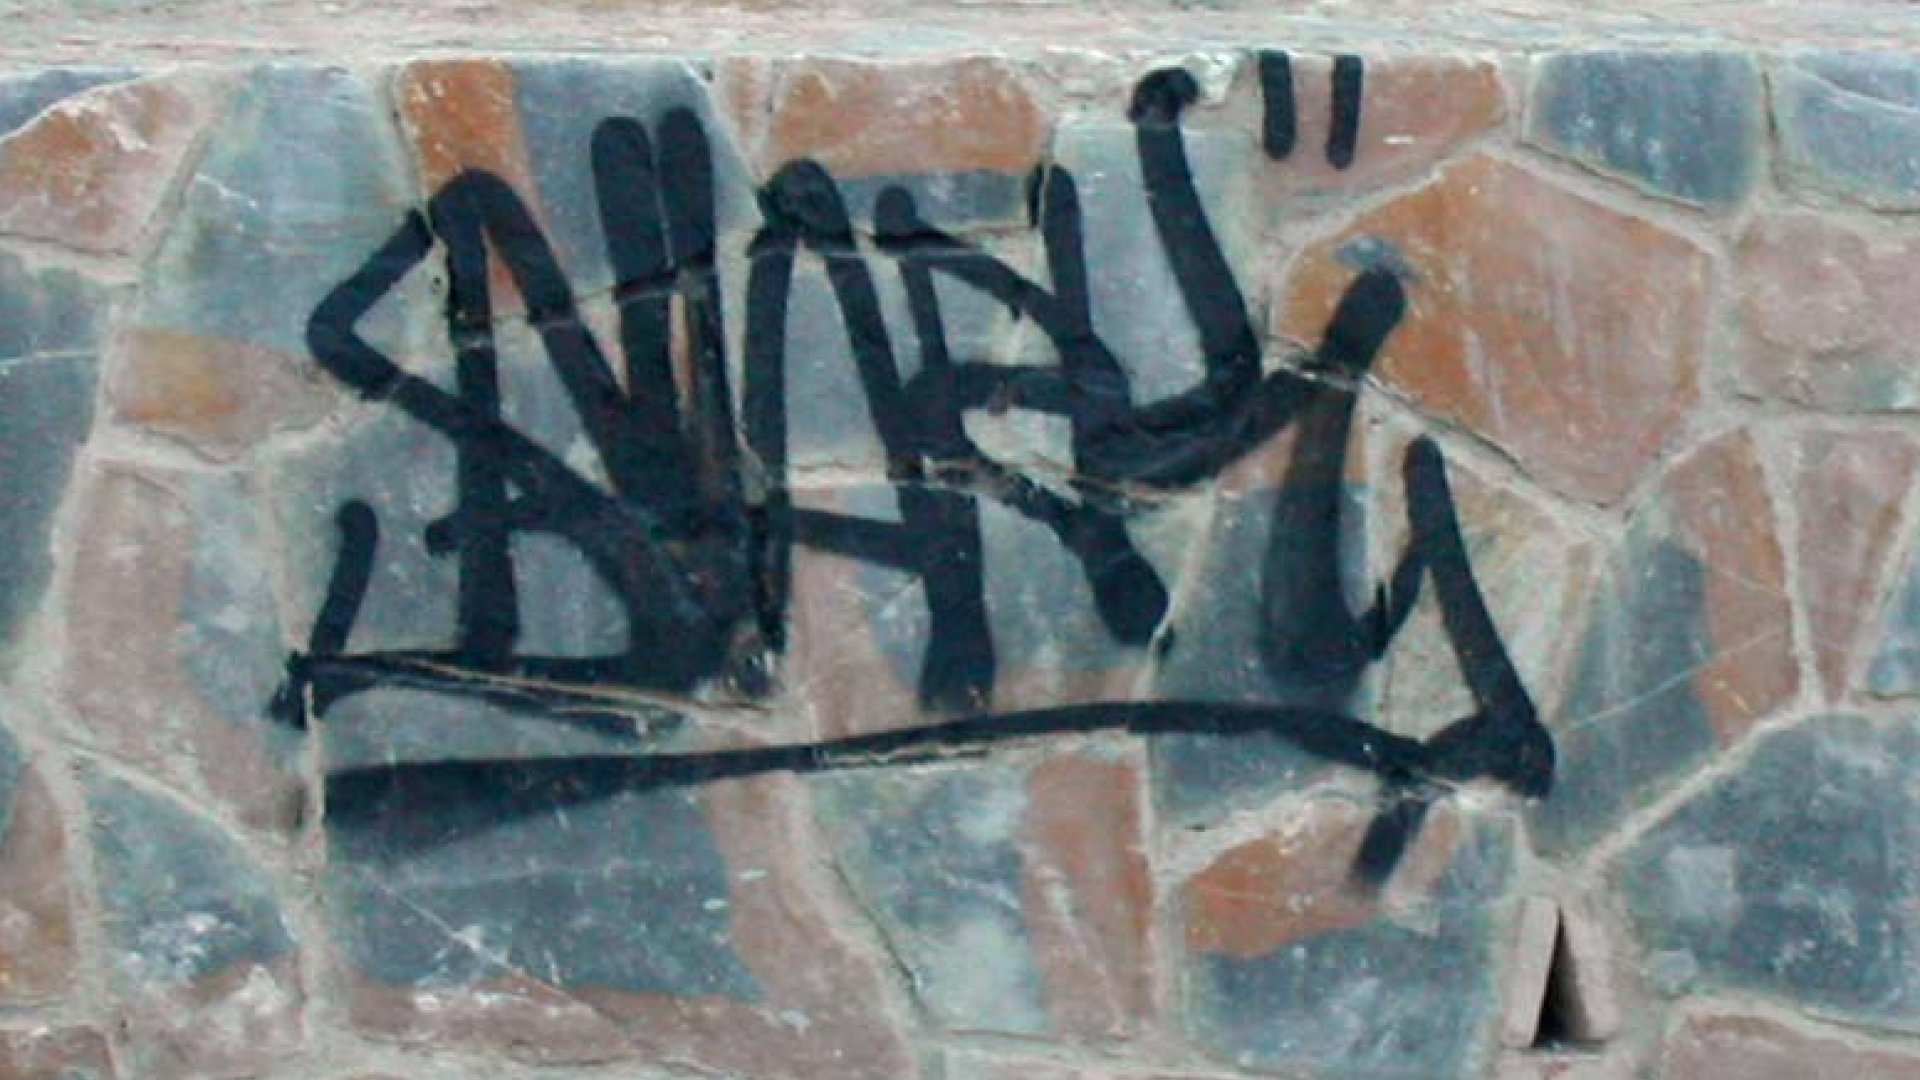 Manchas y grafitis